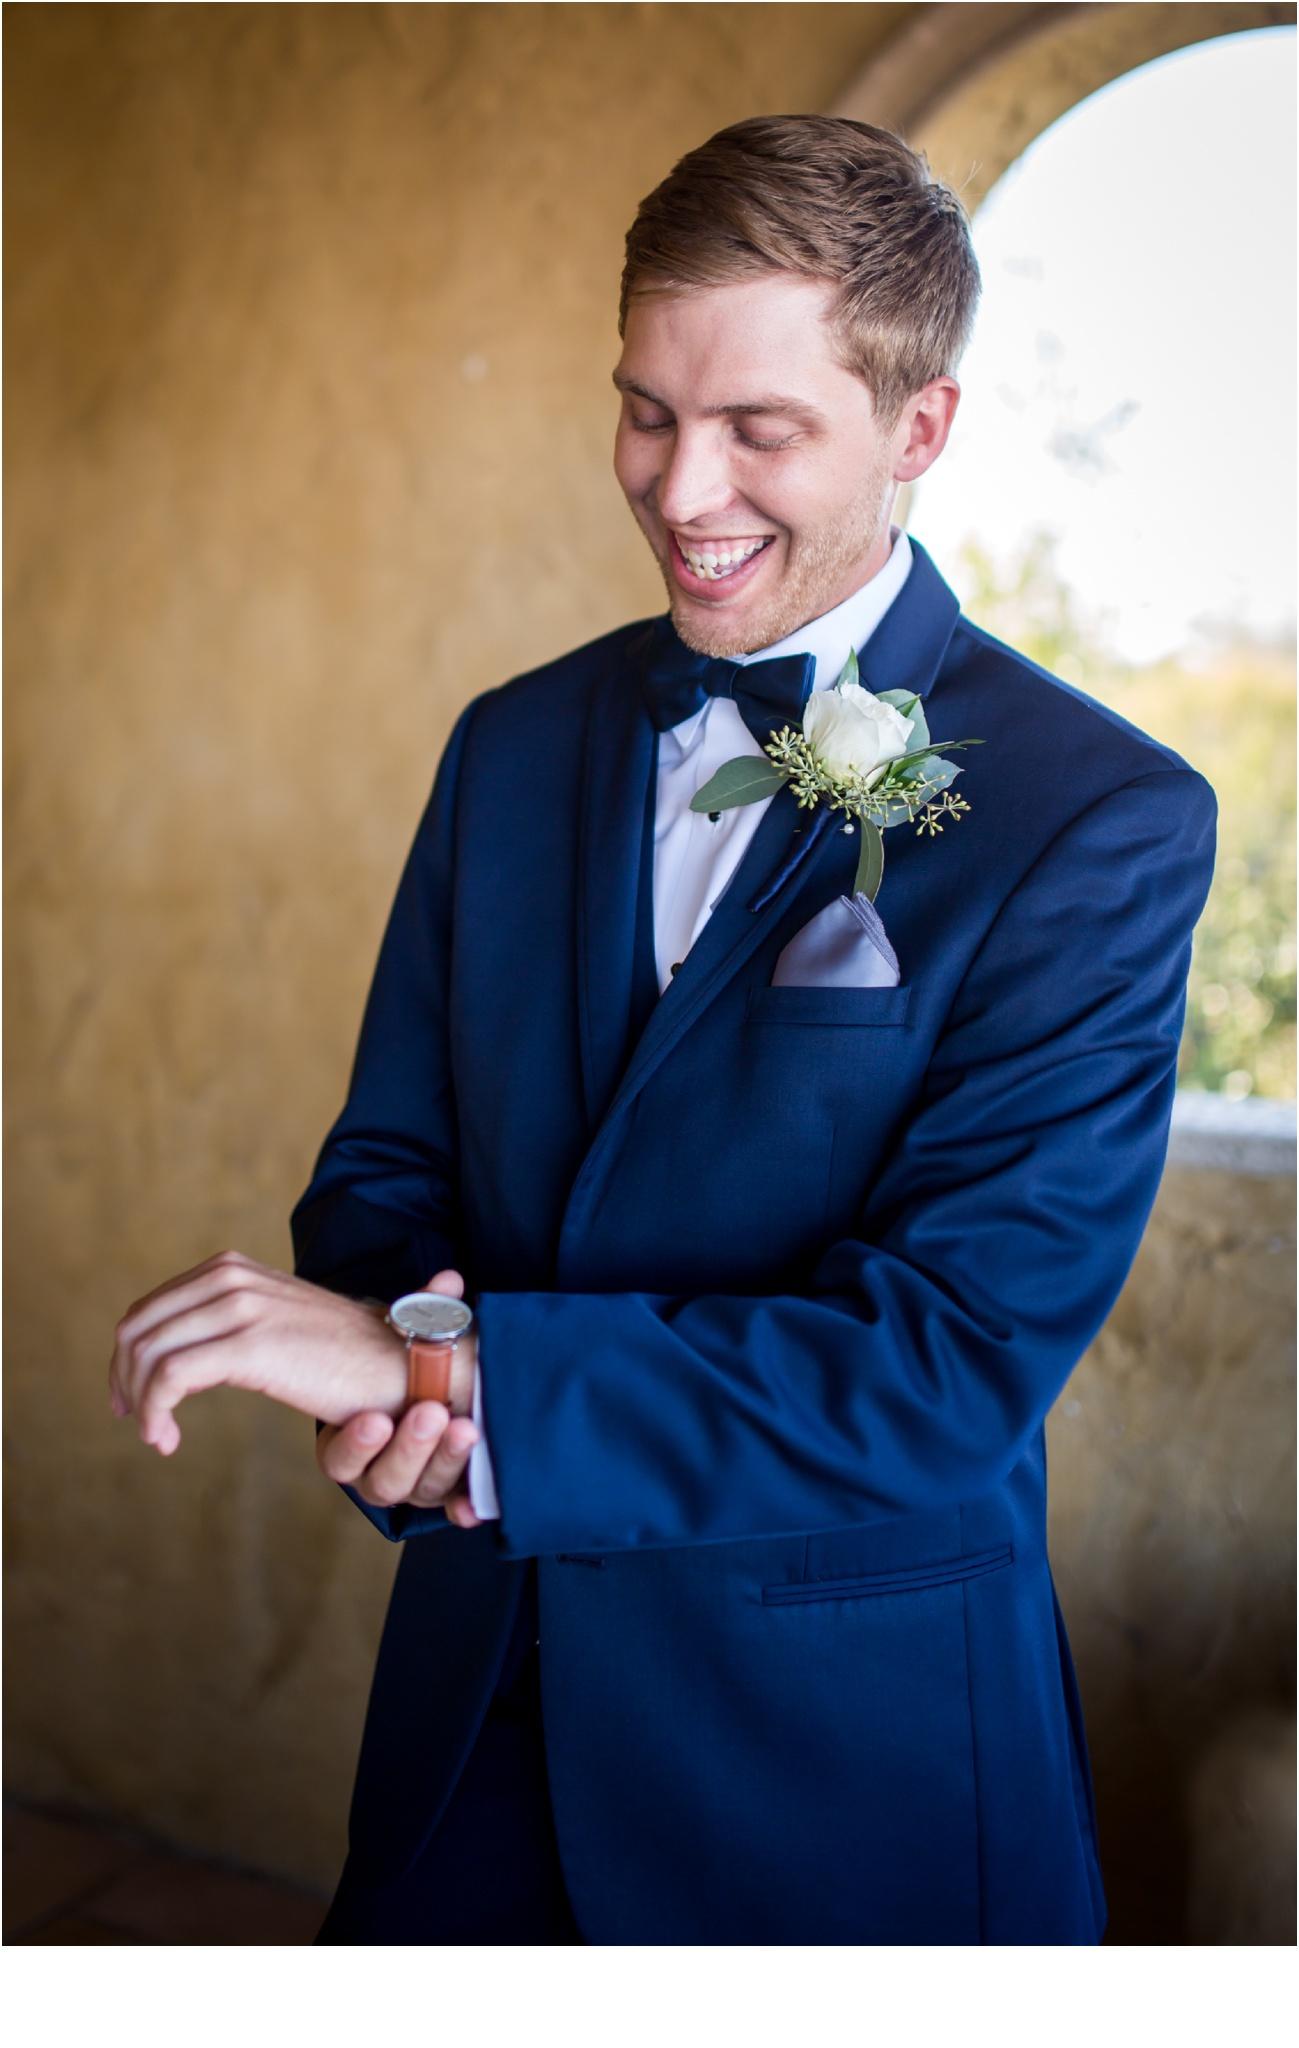 Rainey_Gregg_Photography_St._Simons_Island_Georgia_California_Wedding_Portrait_Photography_0644.jpg